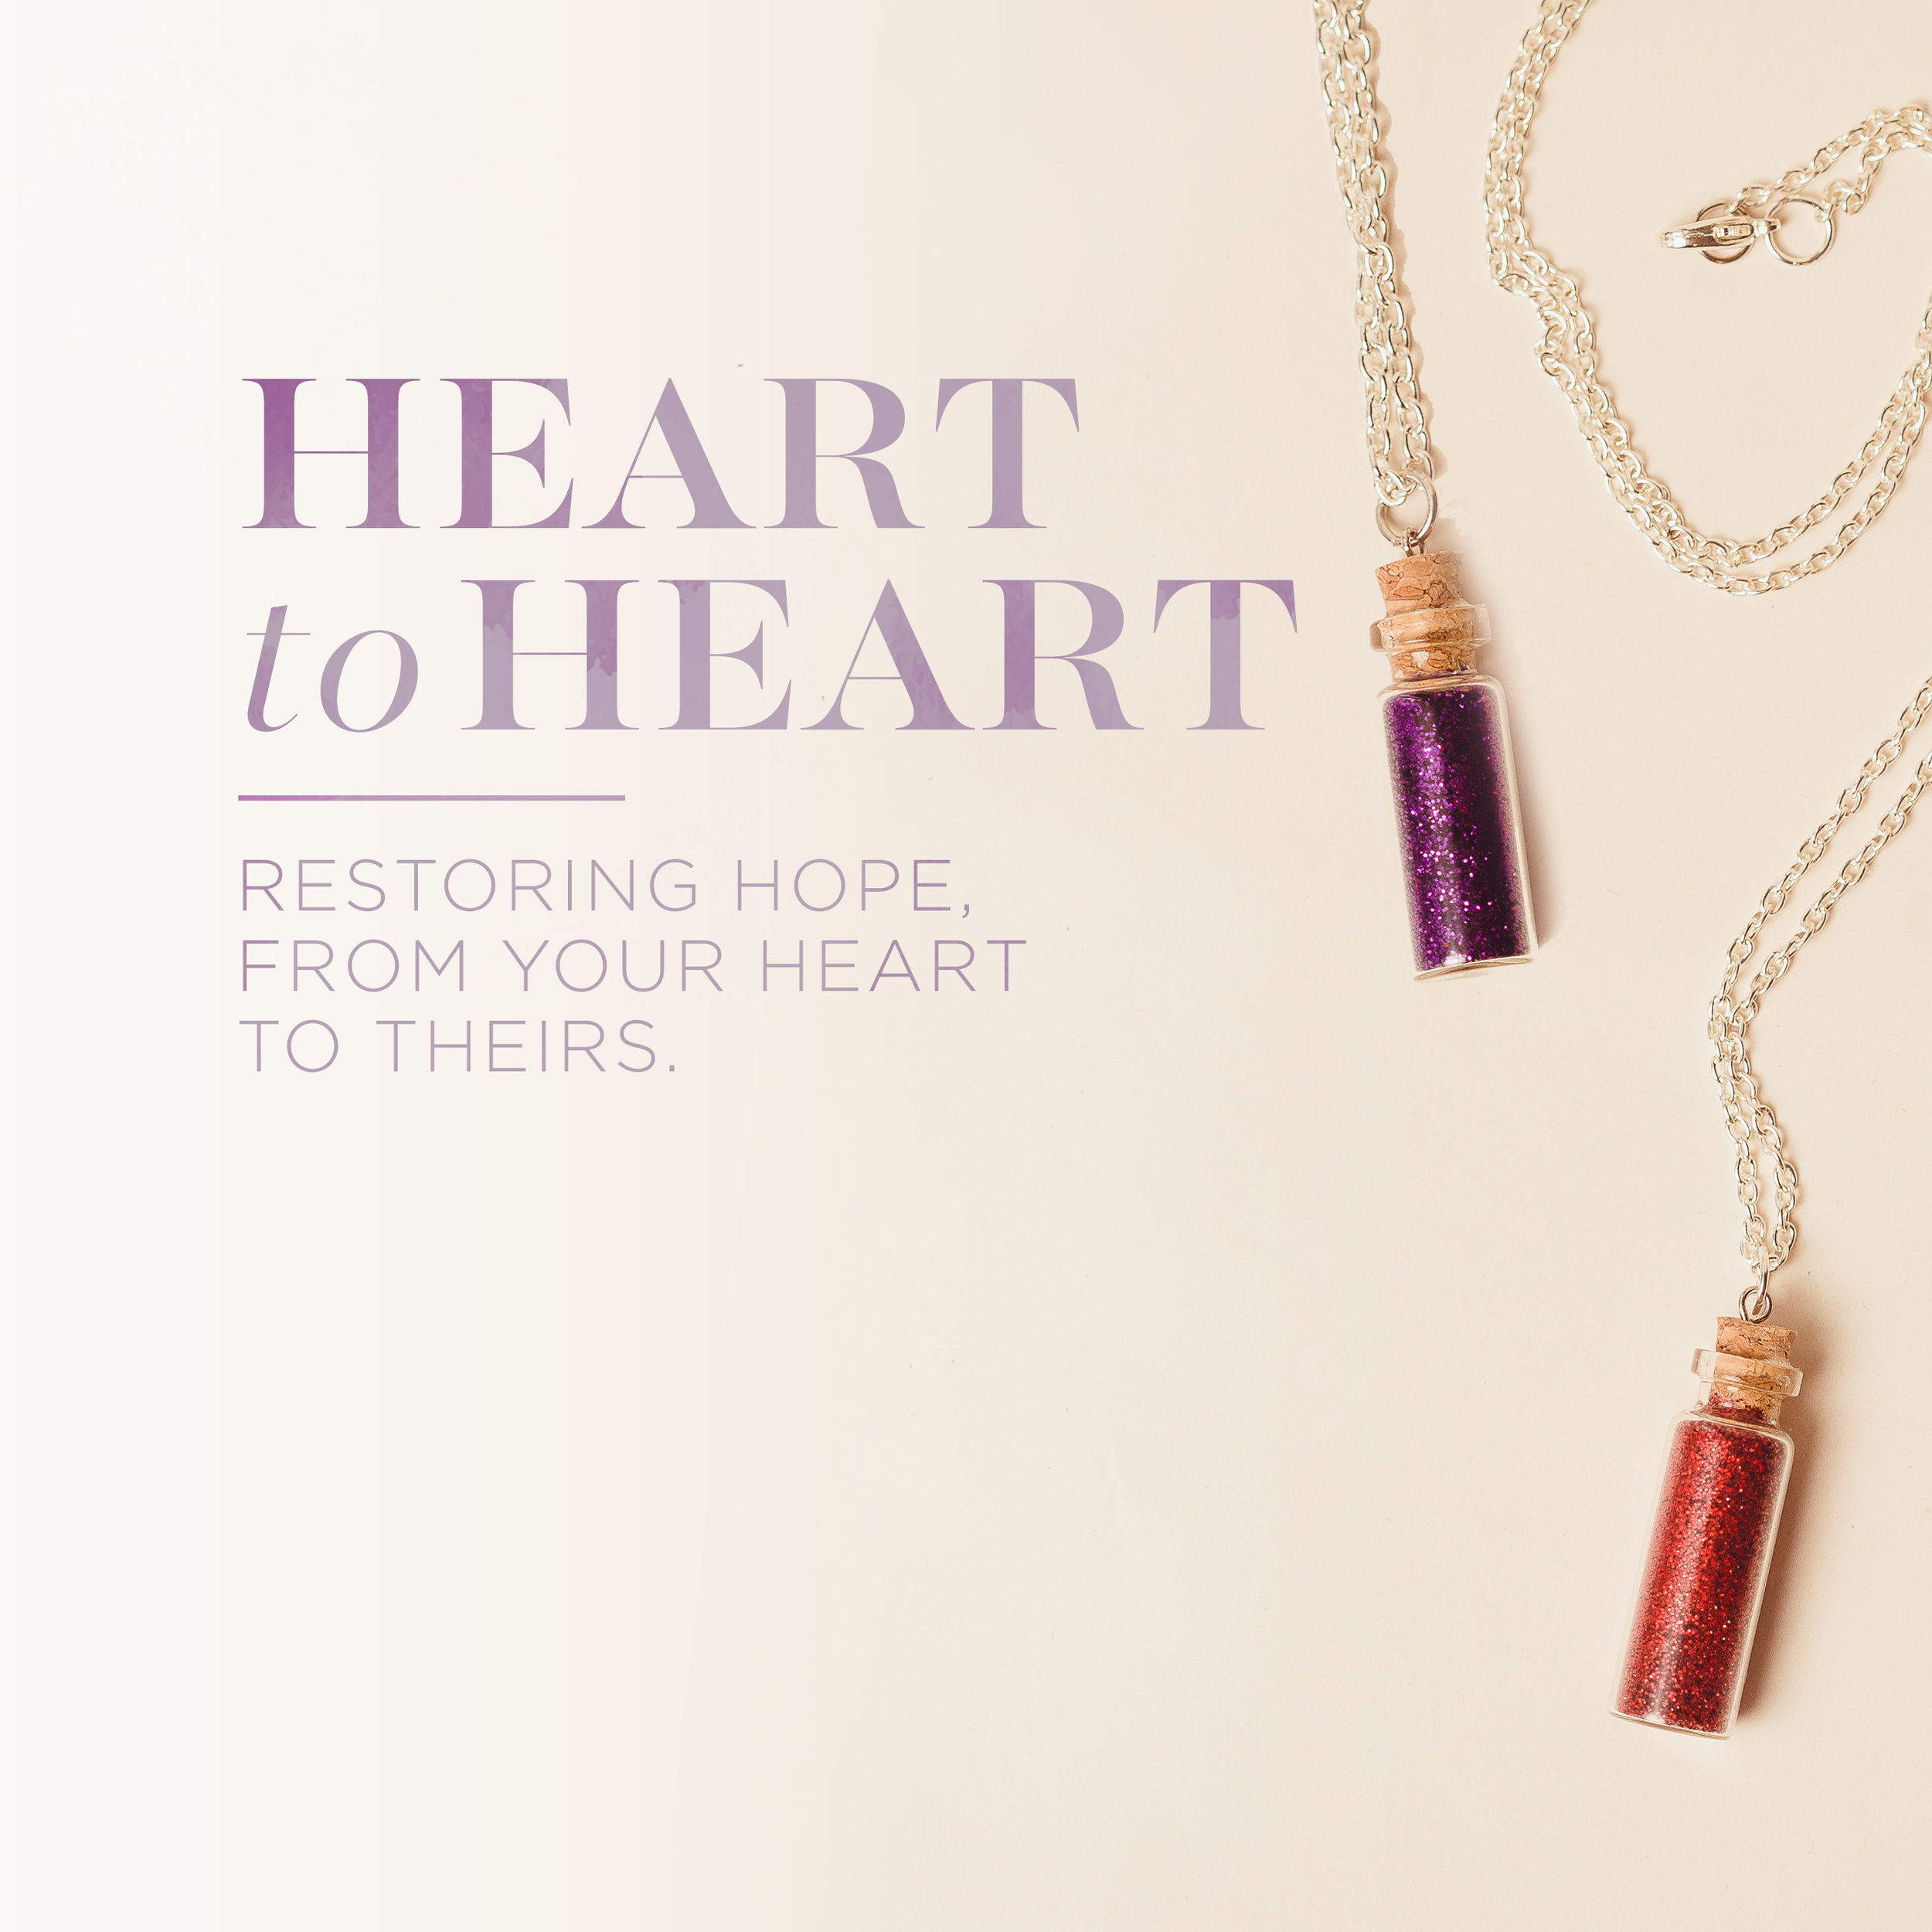 hearttoheart3 (2).jpg